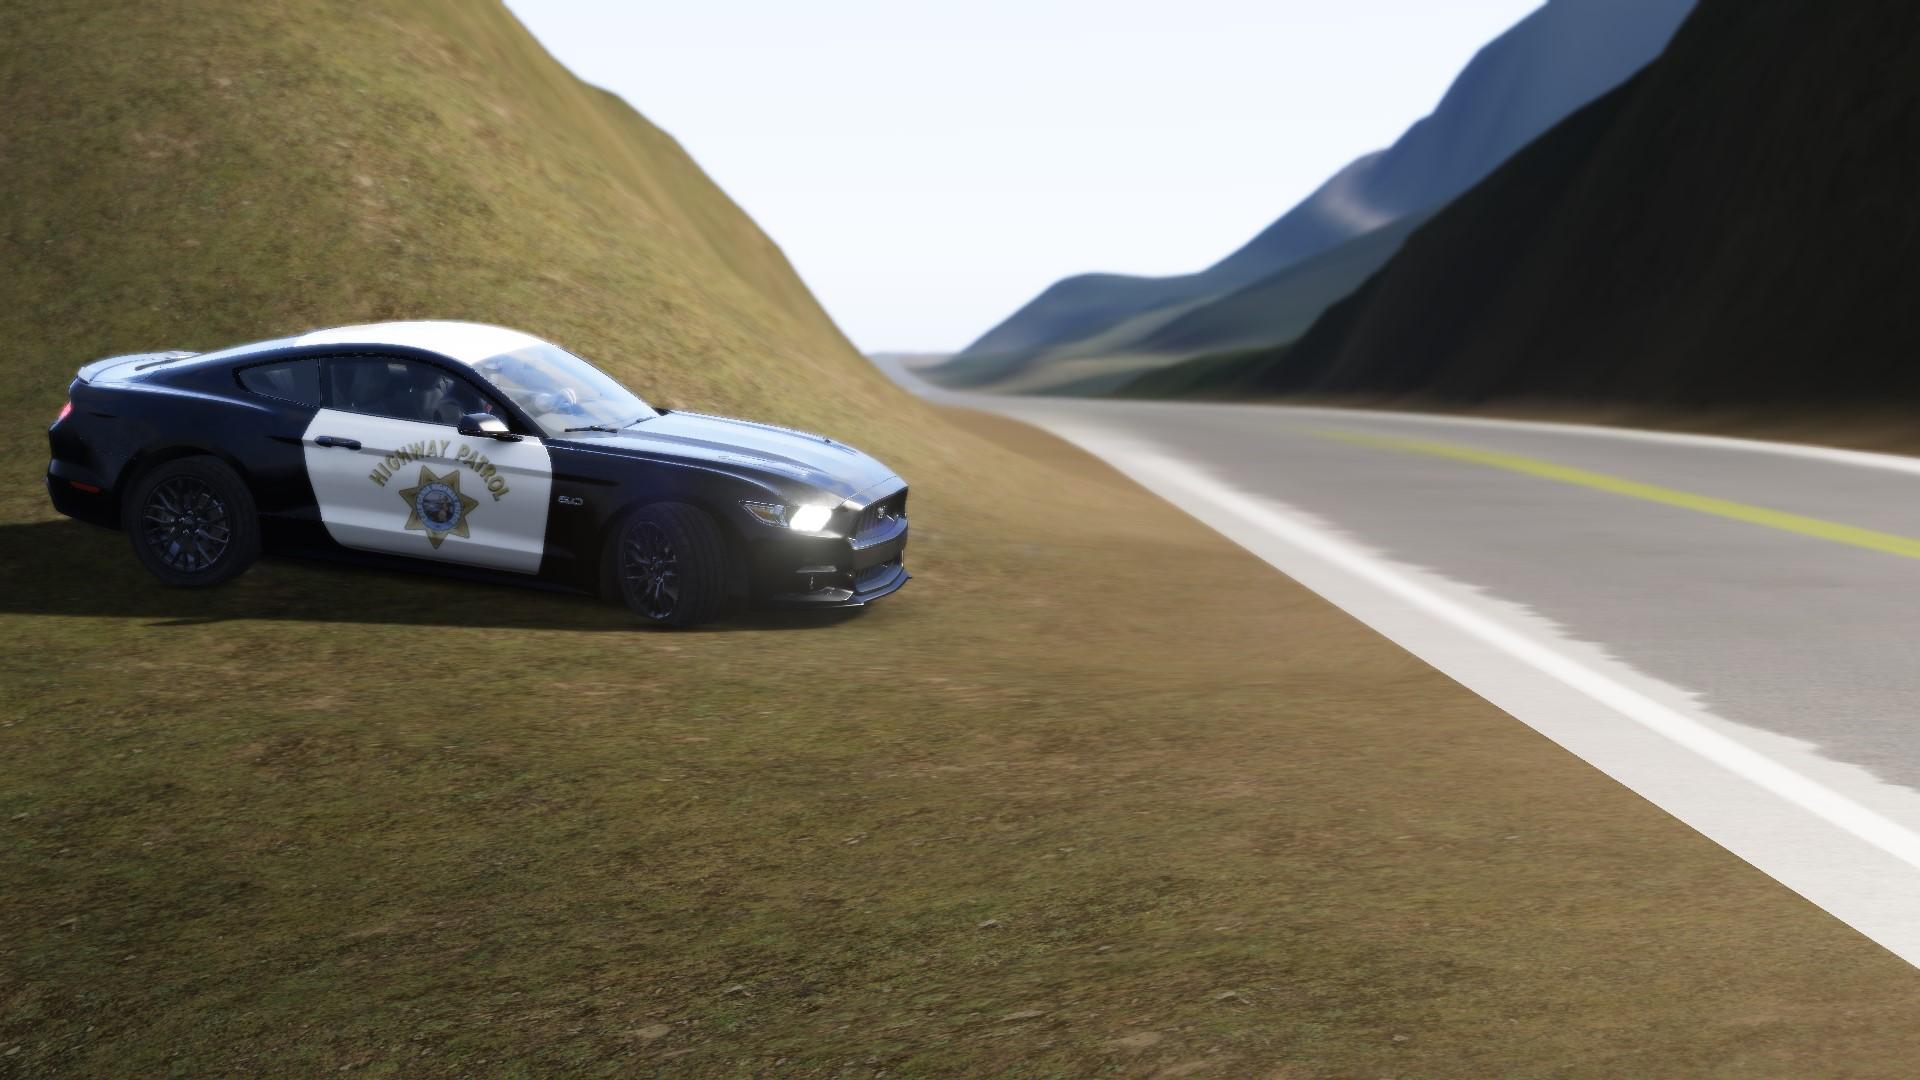 Mustang-Pacific-Coast-0.2-01.jpg